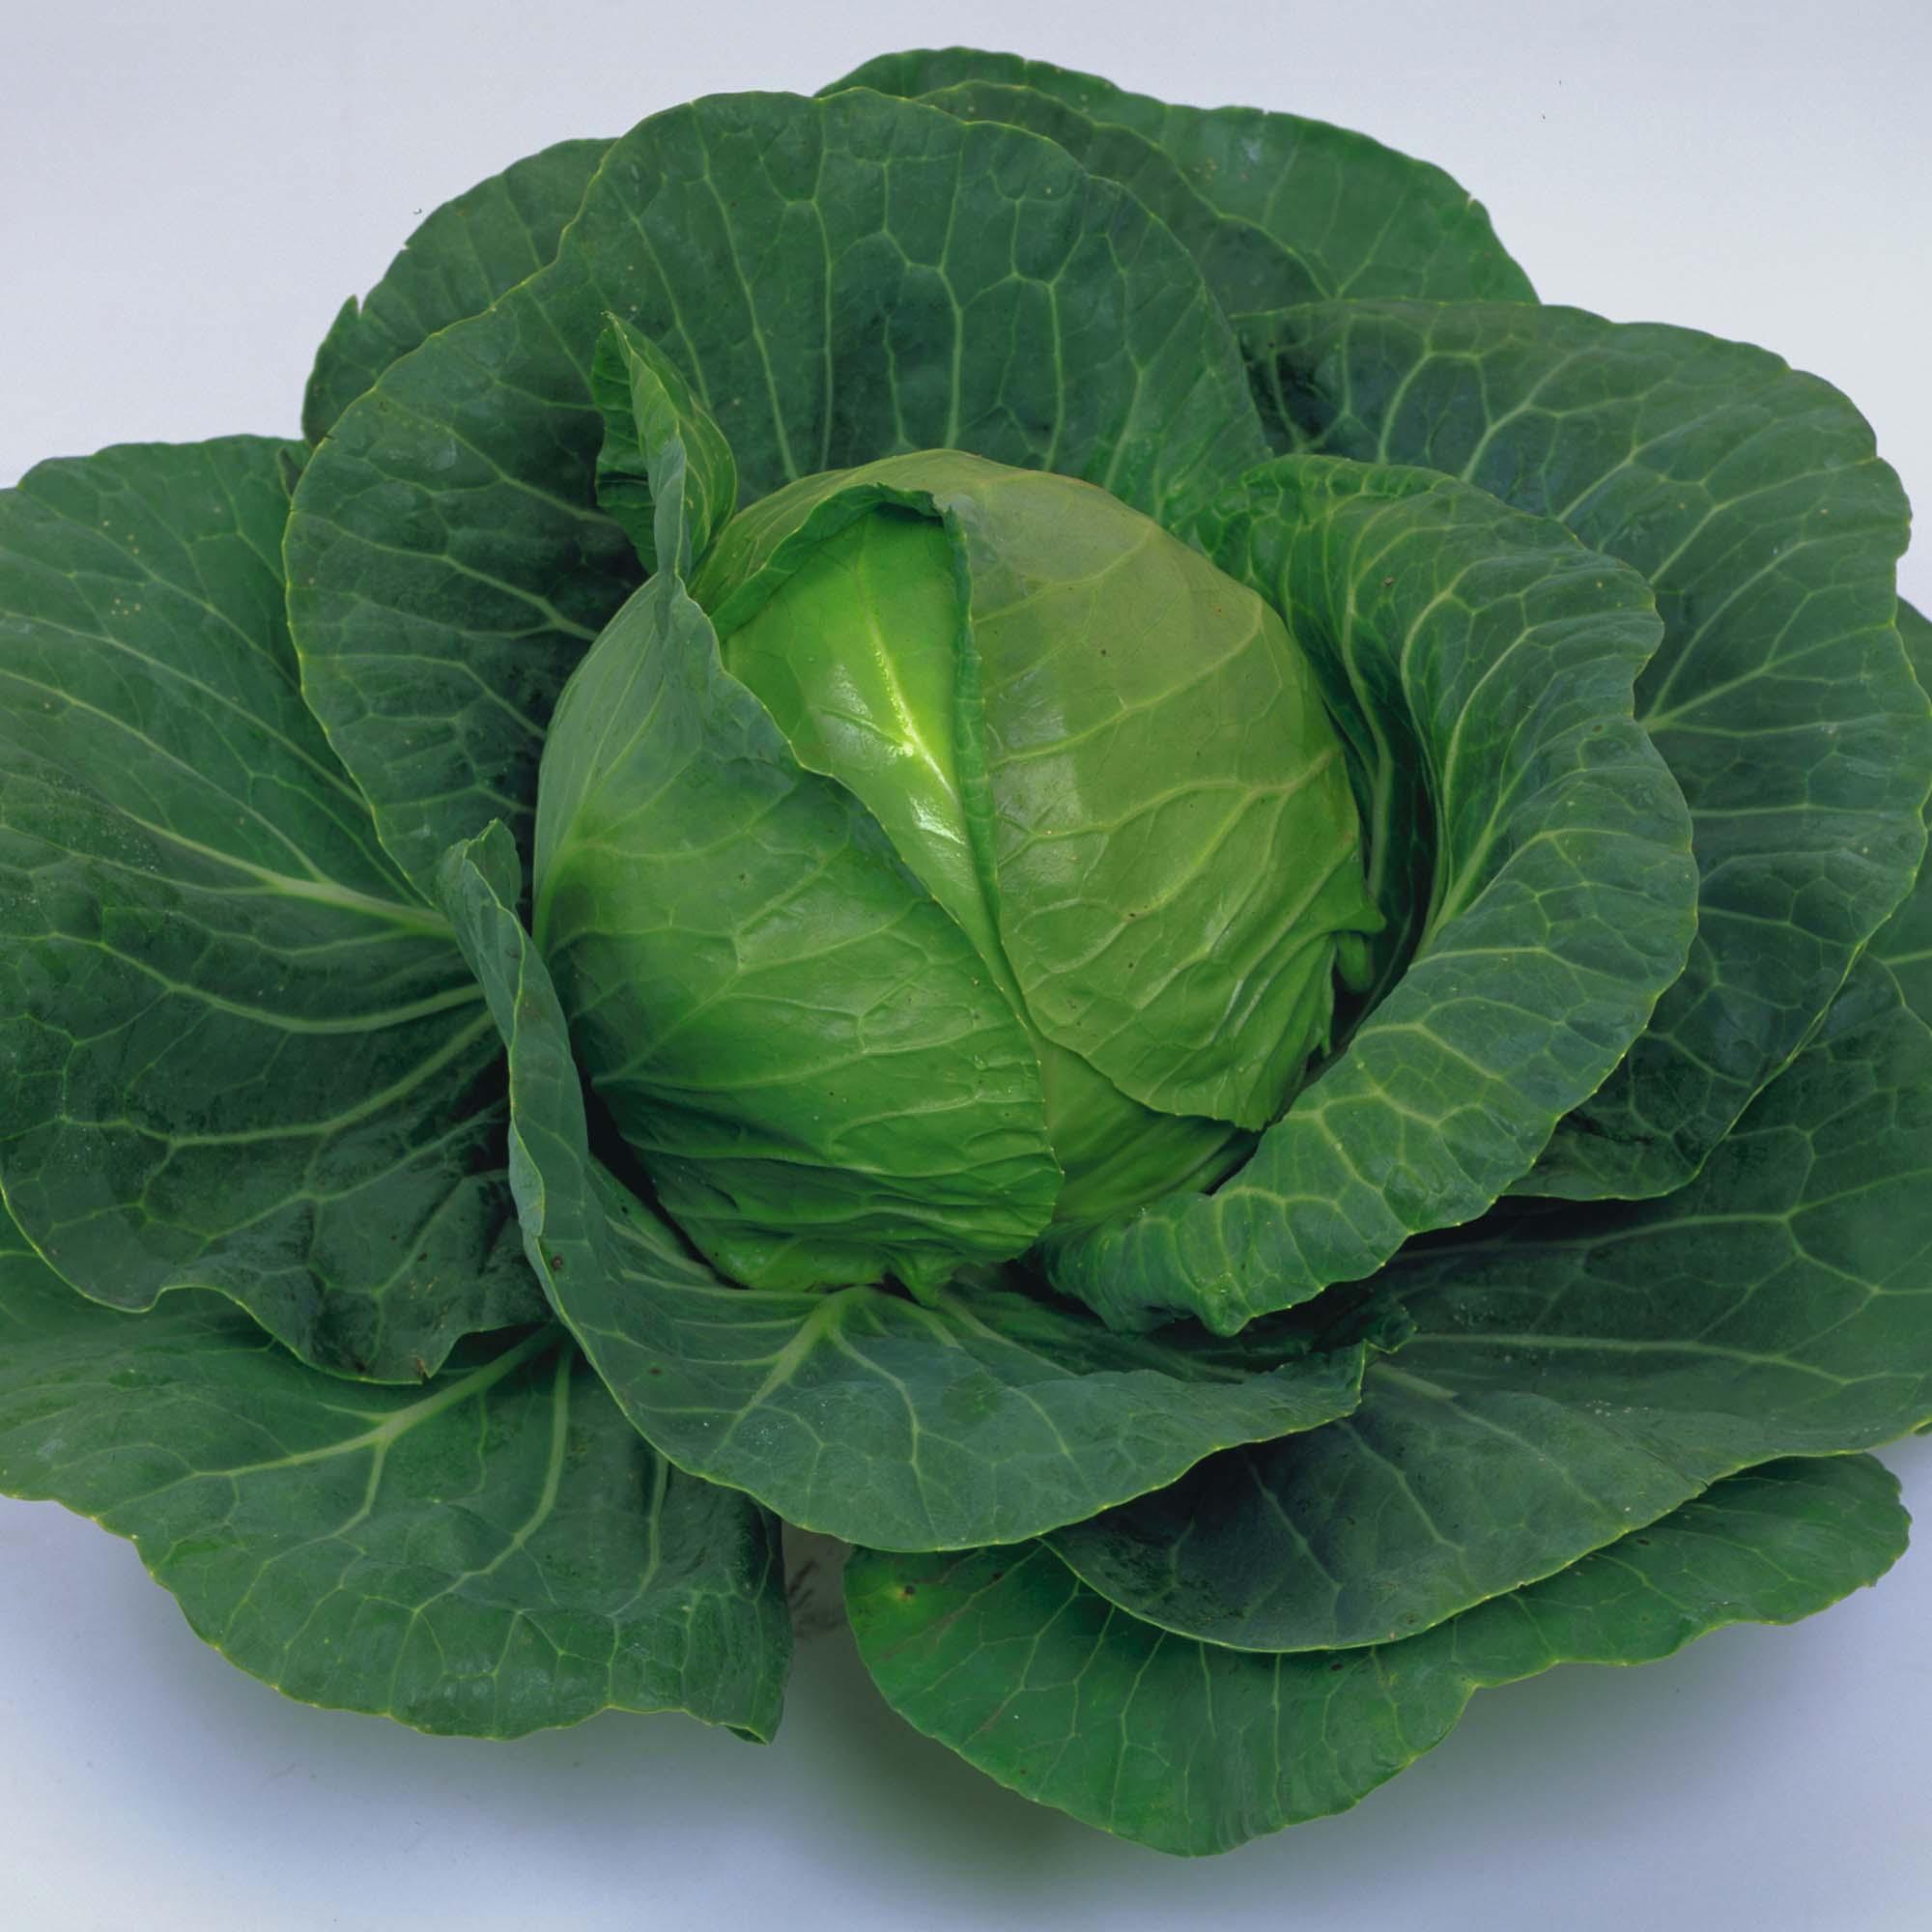 Image of Cabbage 'Elisa' F1 Hybrid (Summer)